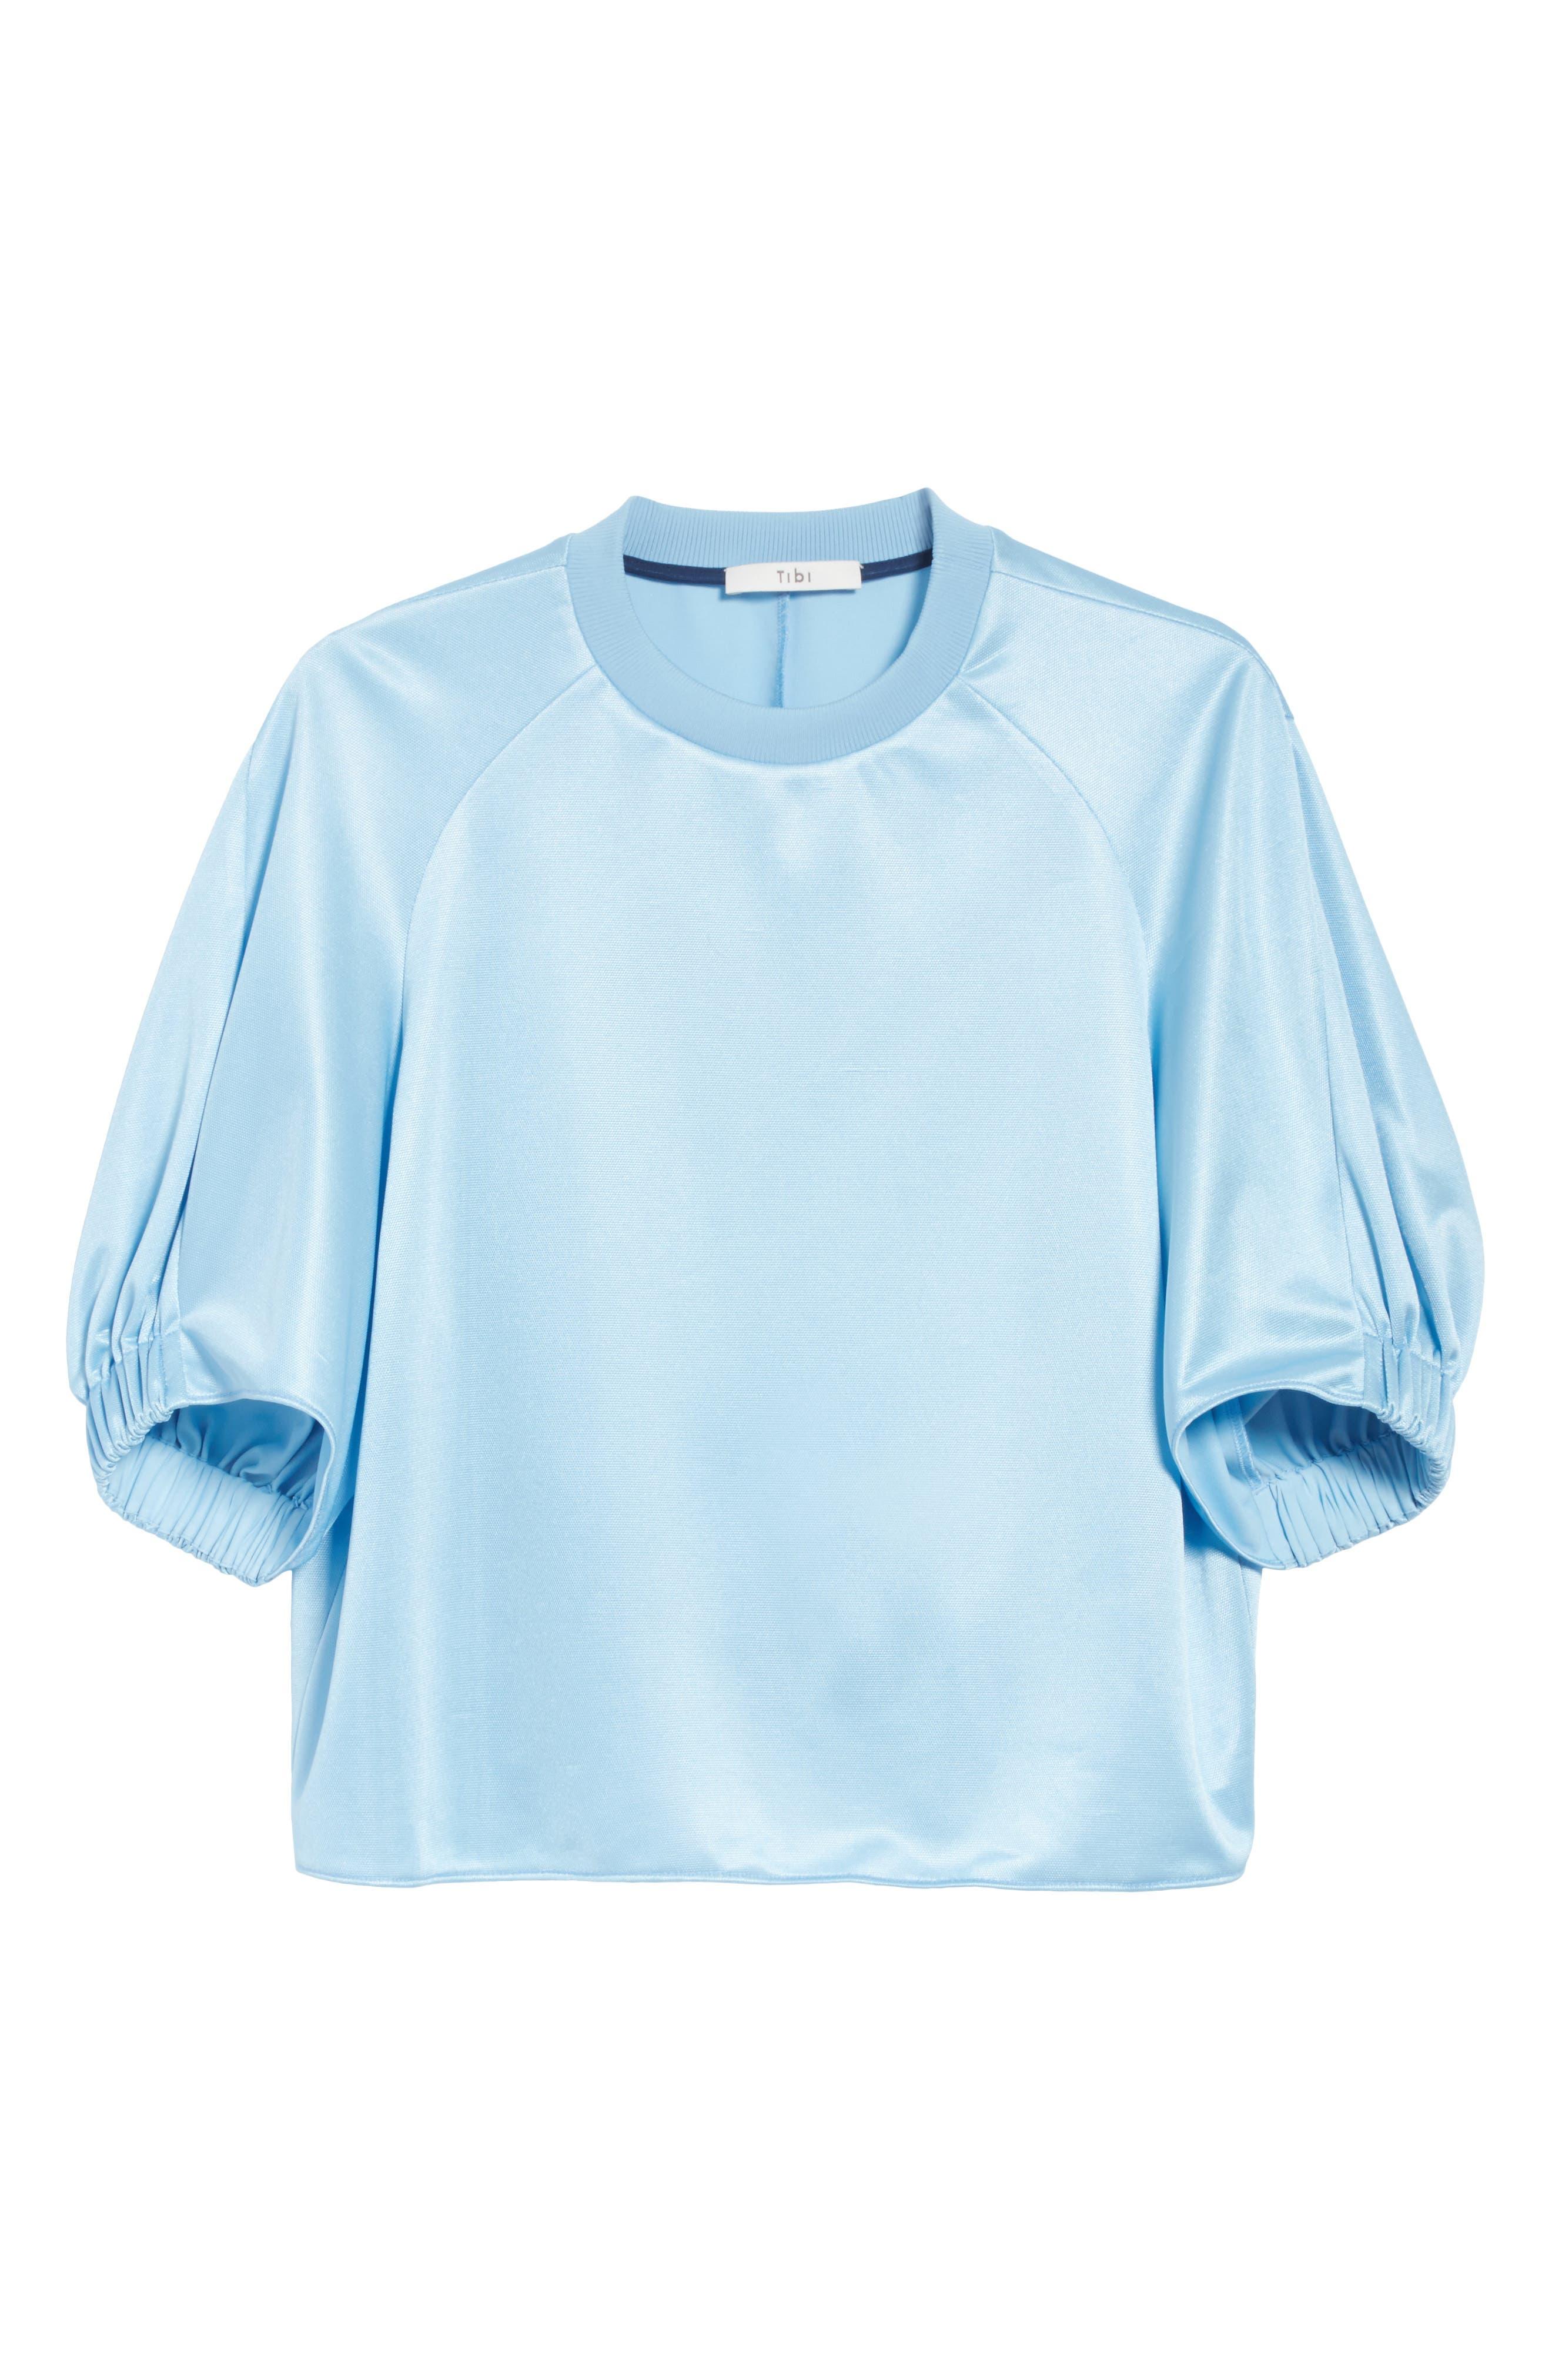 Dolman Sleeve Top,                             Alternate thumbnail 6, color,                             401